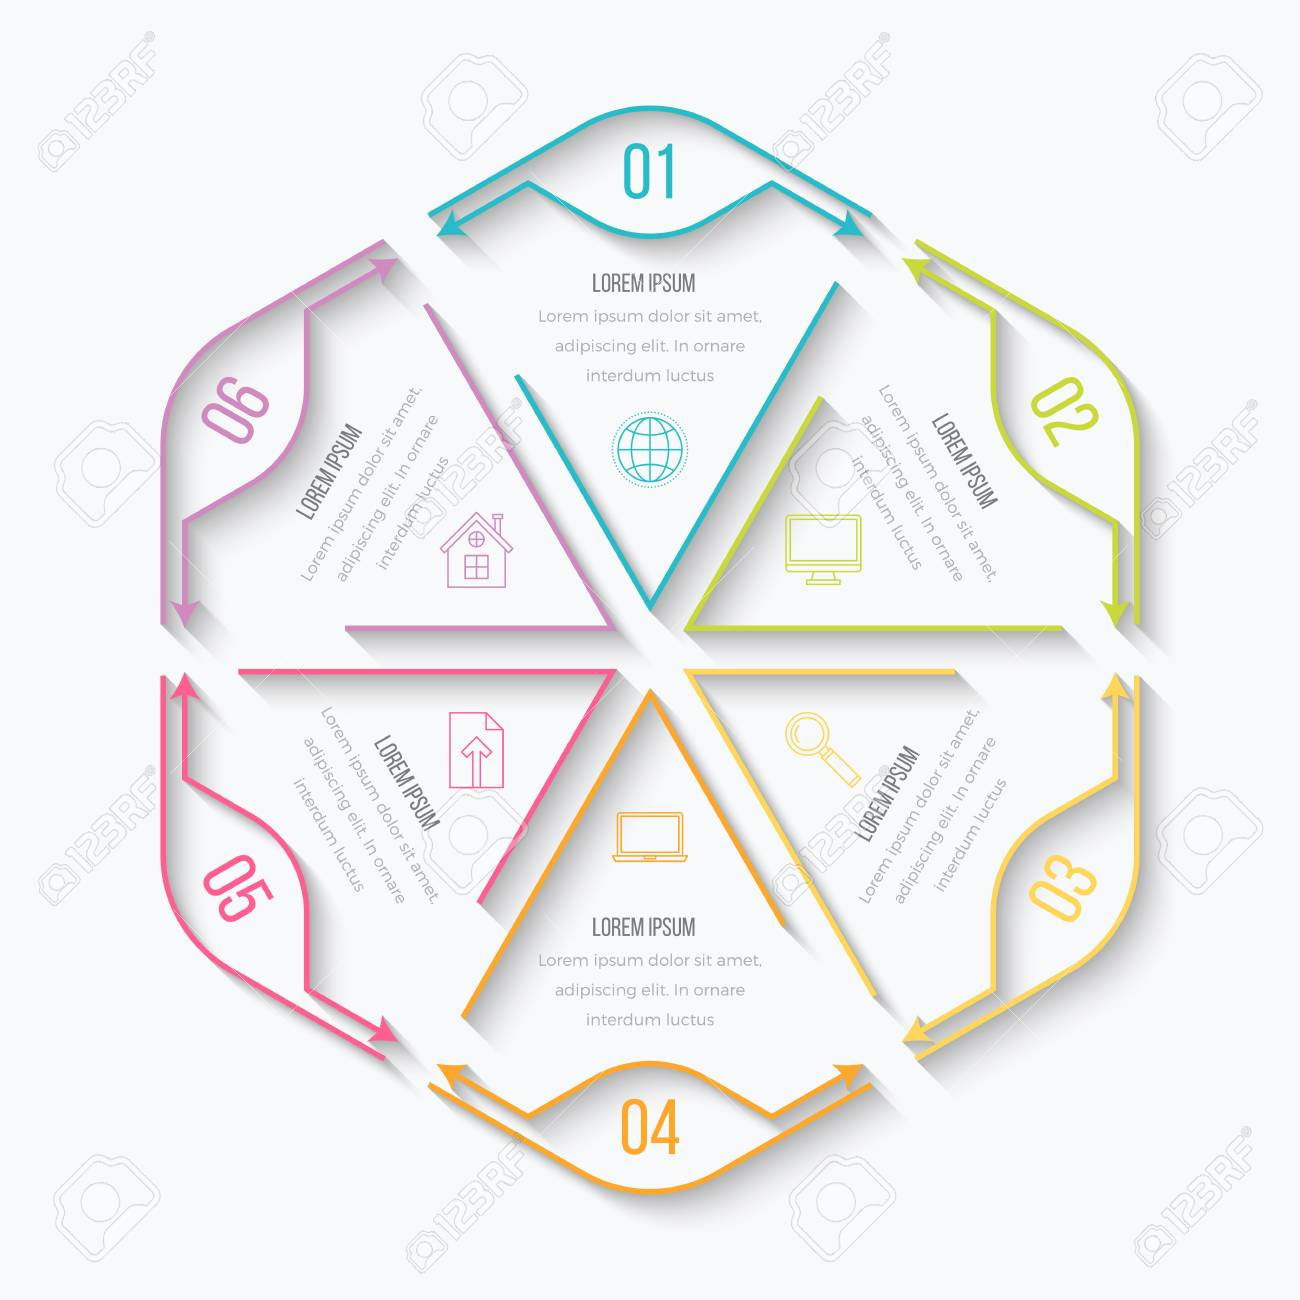 Dünne Linie Infografik-Element. Linear Flache Diagramm, Diagramm ...